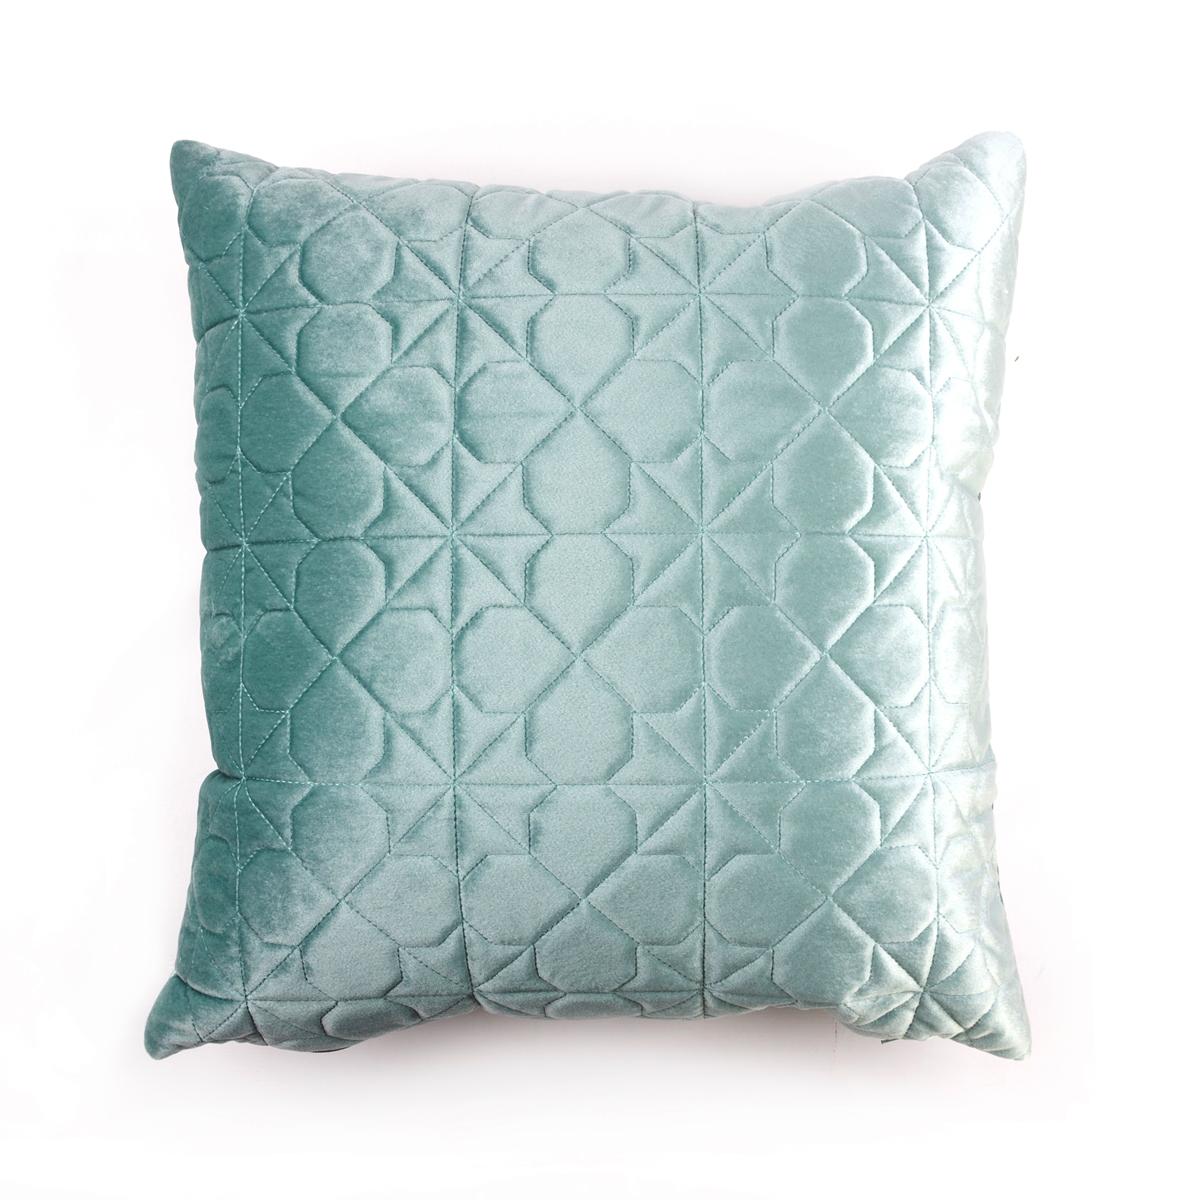 Купить Декоративные подушки Arya, Декоративная наволочка Bradburn Цвет: Аква (45х45 см), Турция, Полиэстер